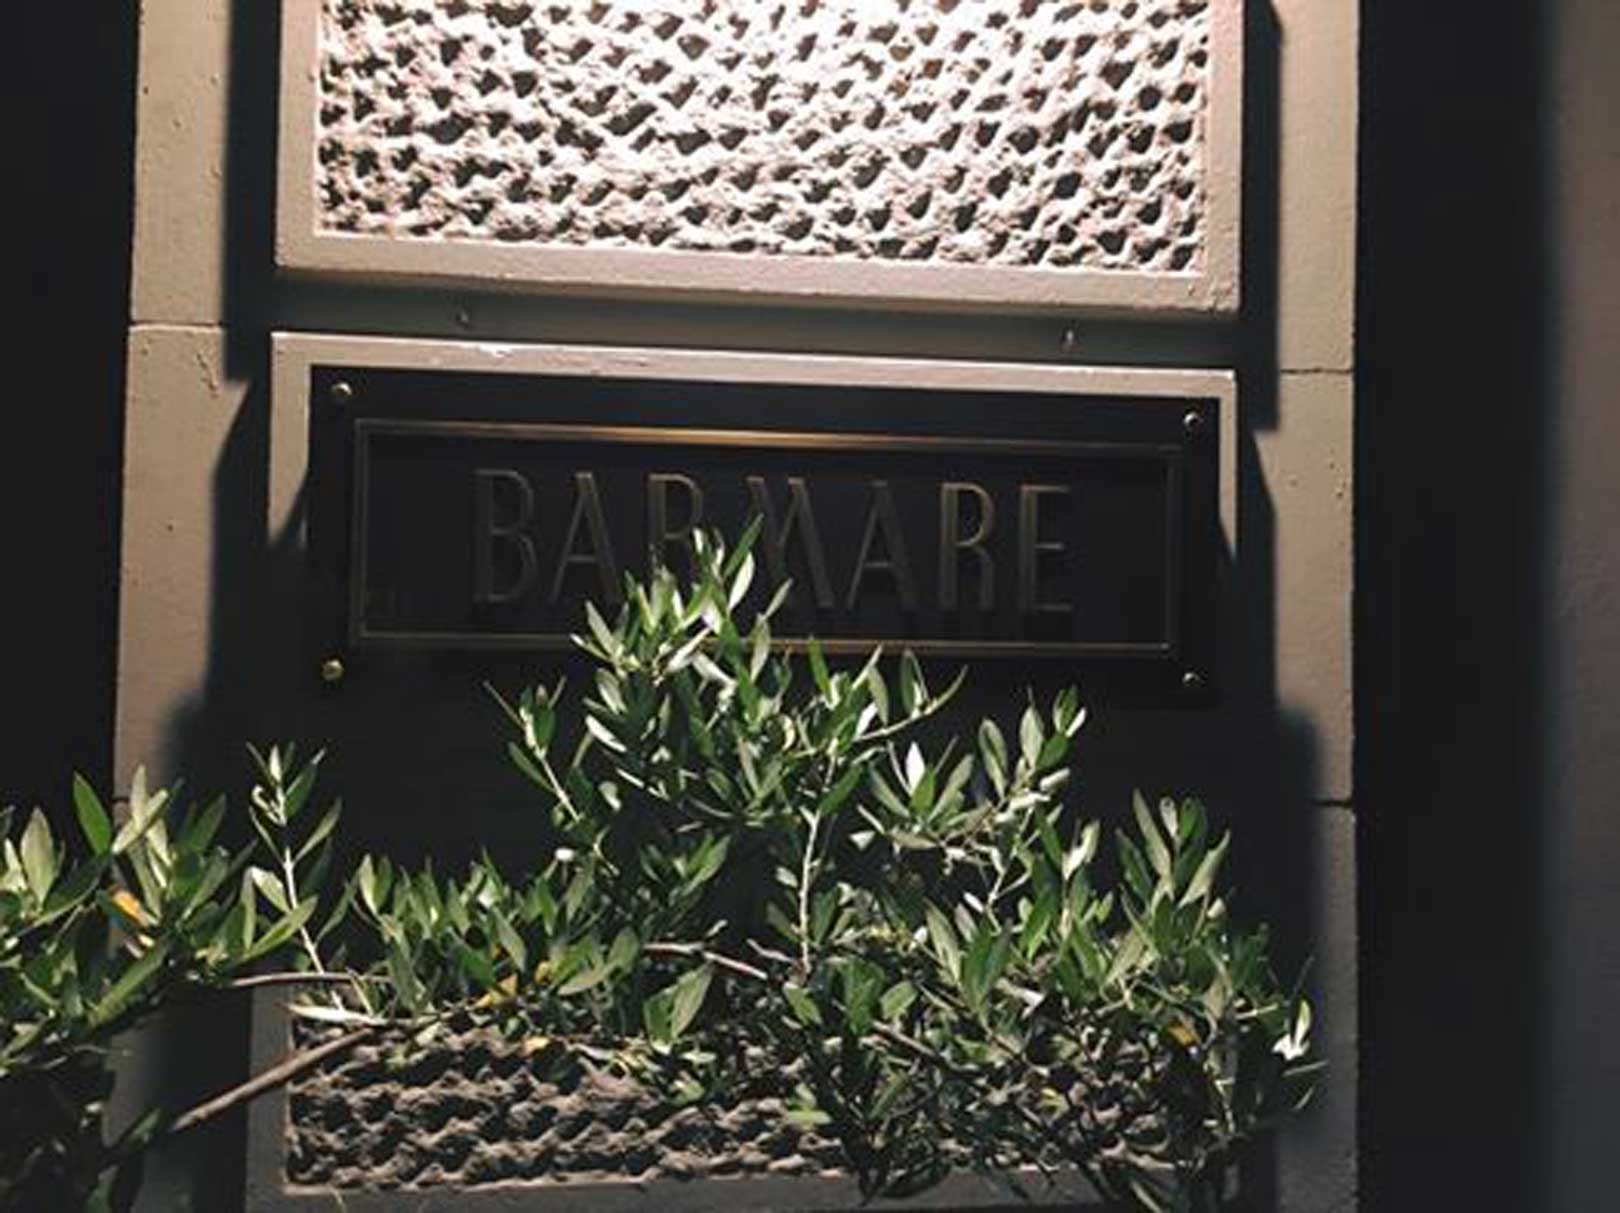 Barmare | Ingresso